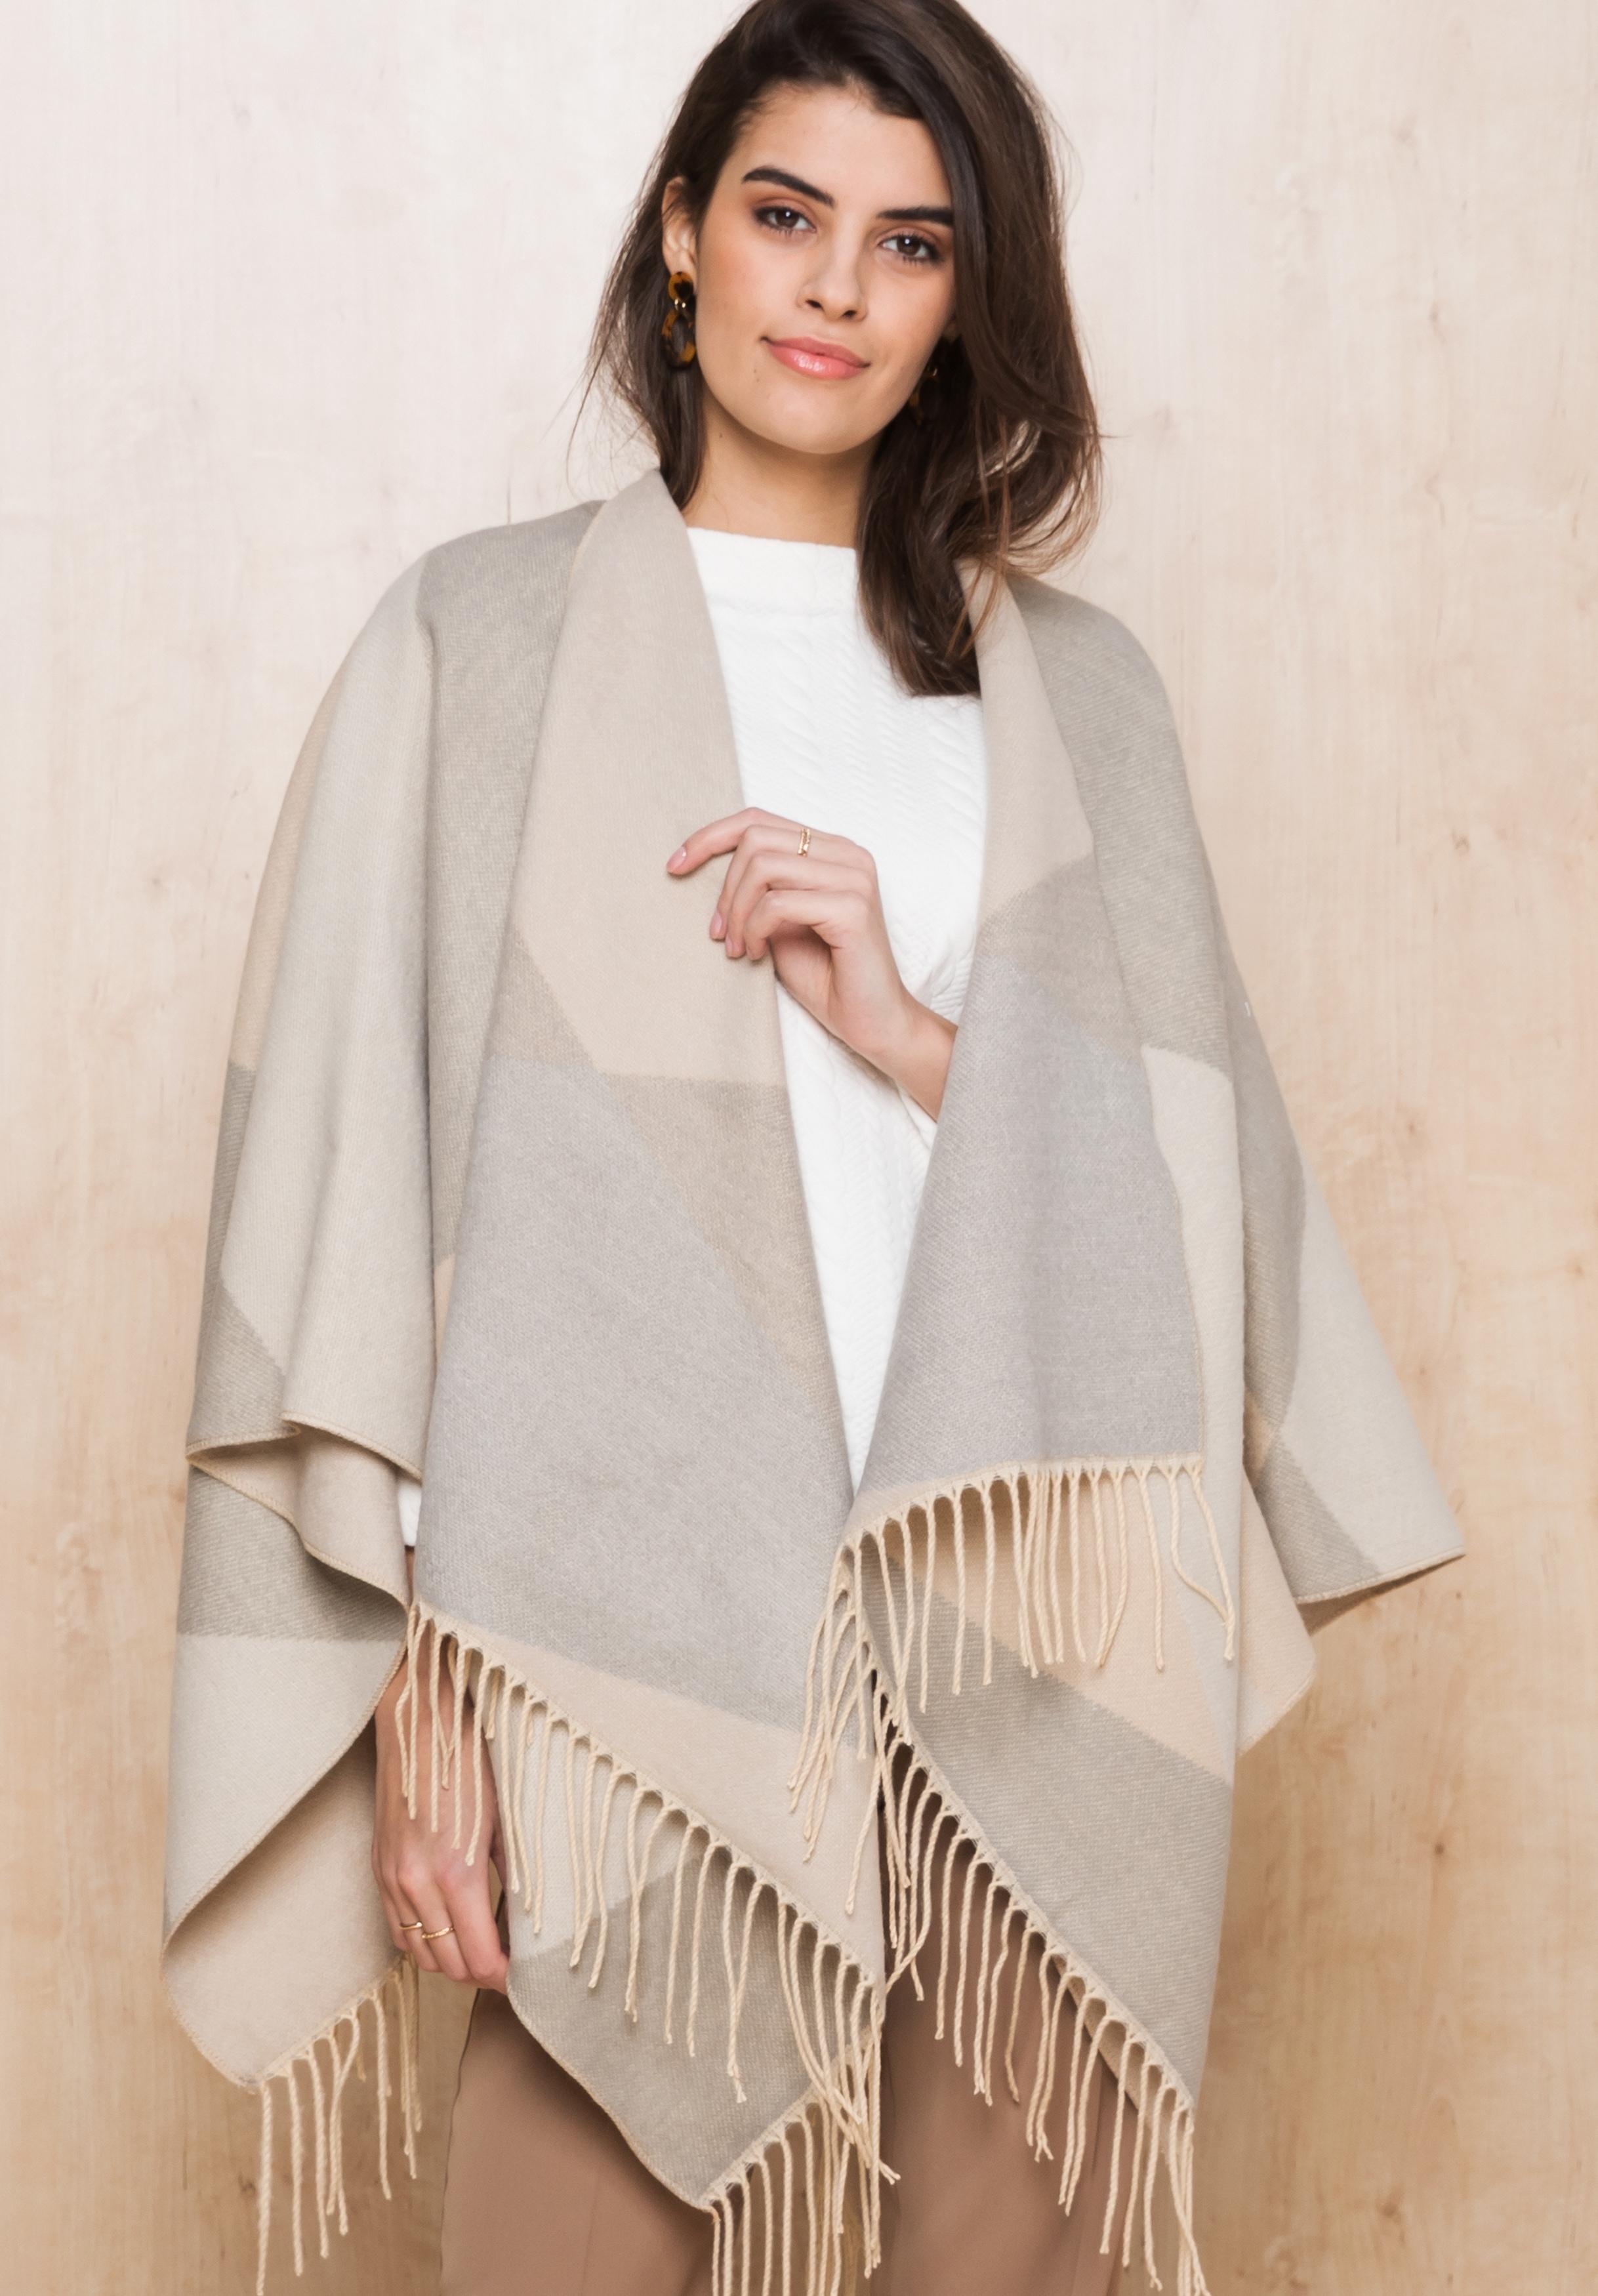 bianca -  Modeschal KAPA, im Poncho-Style in soften Tönen